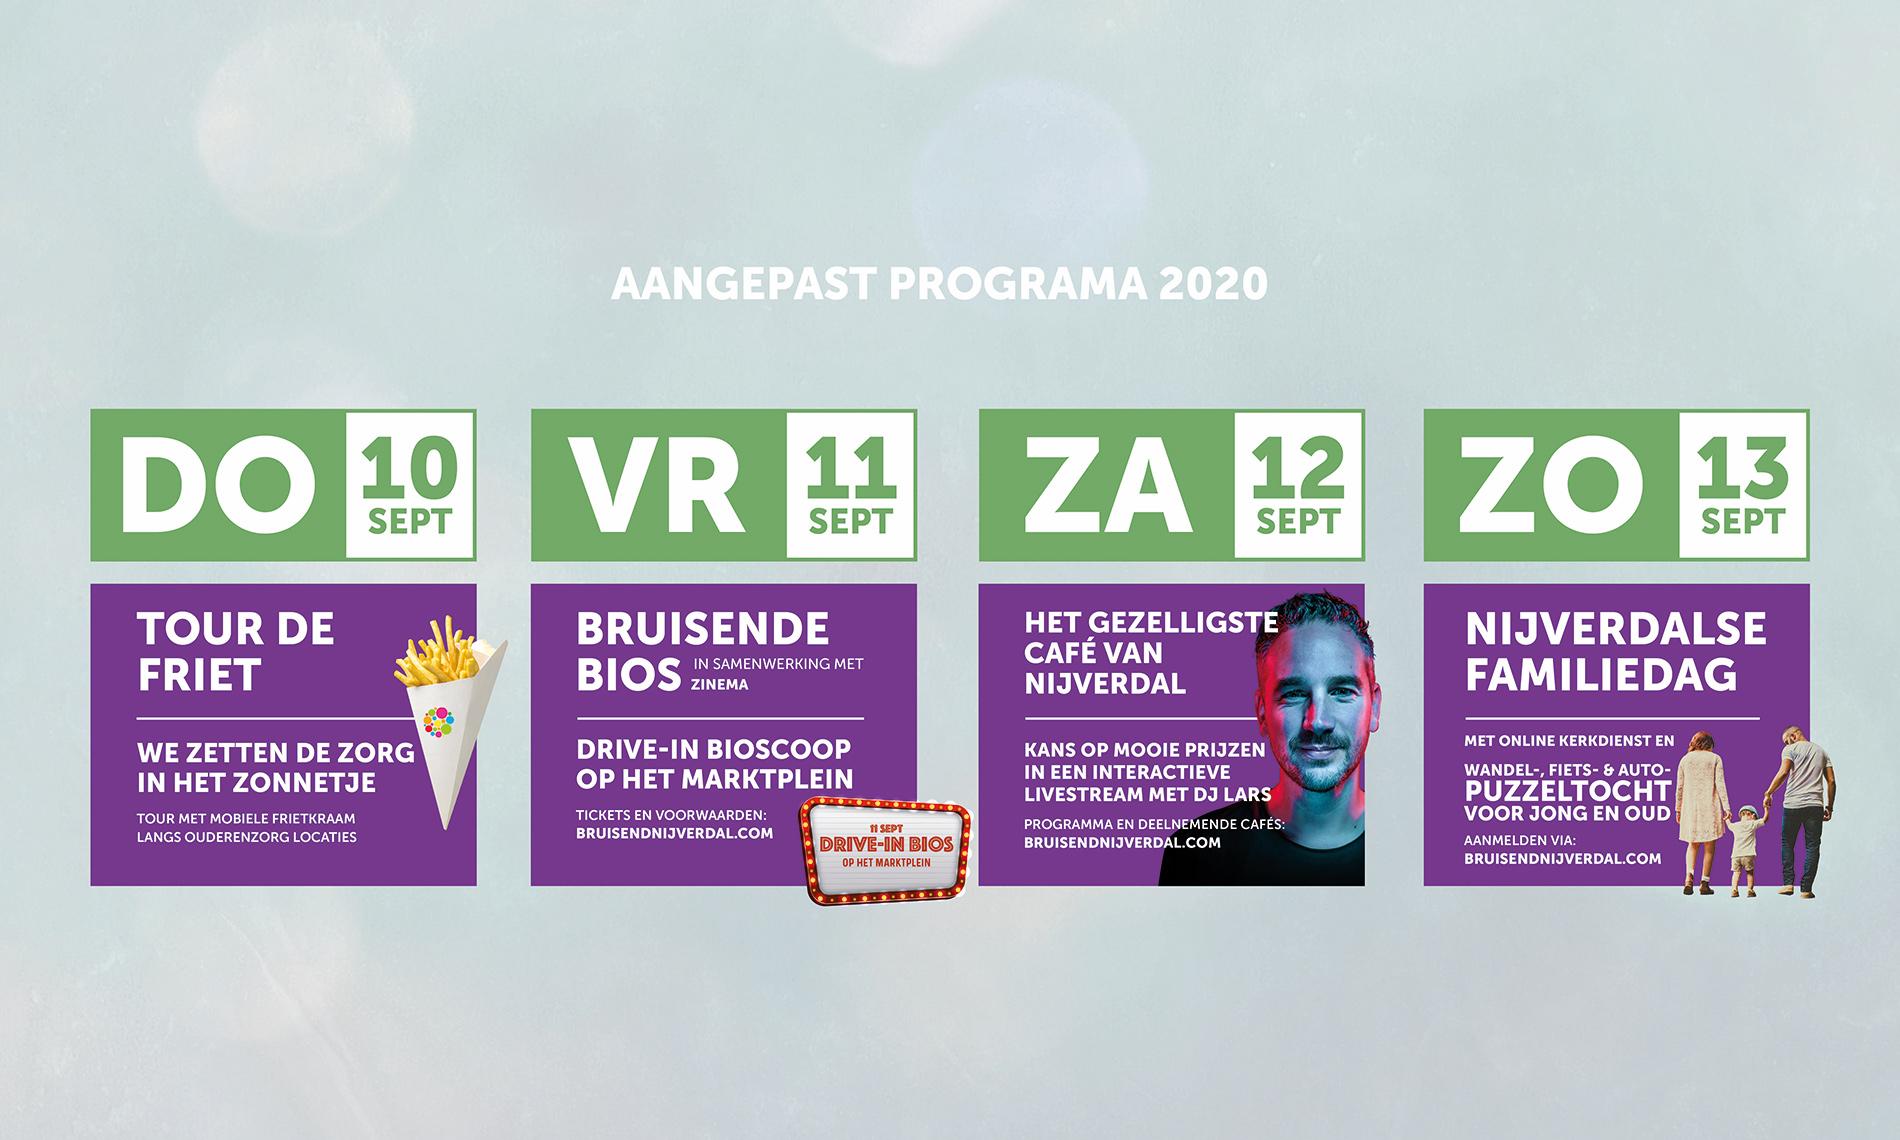 Bruisend nijverdal aangepast programma 2020